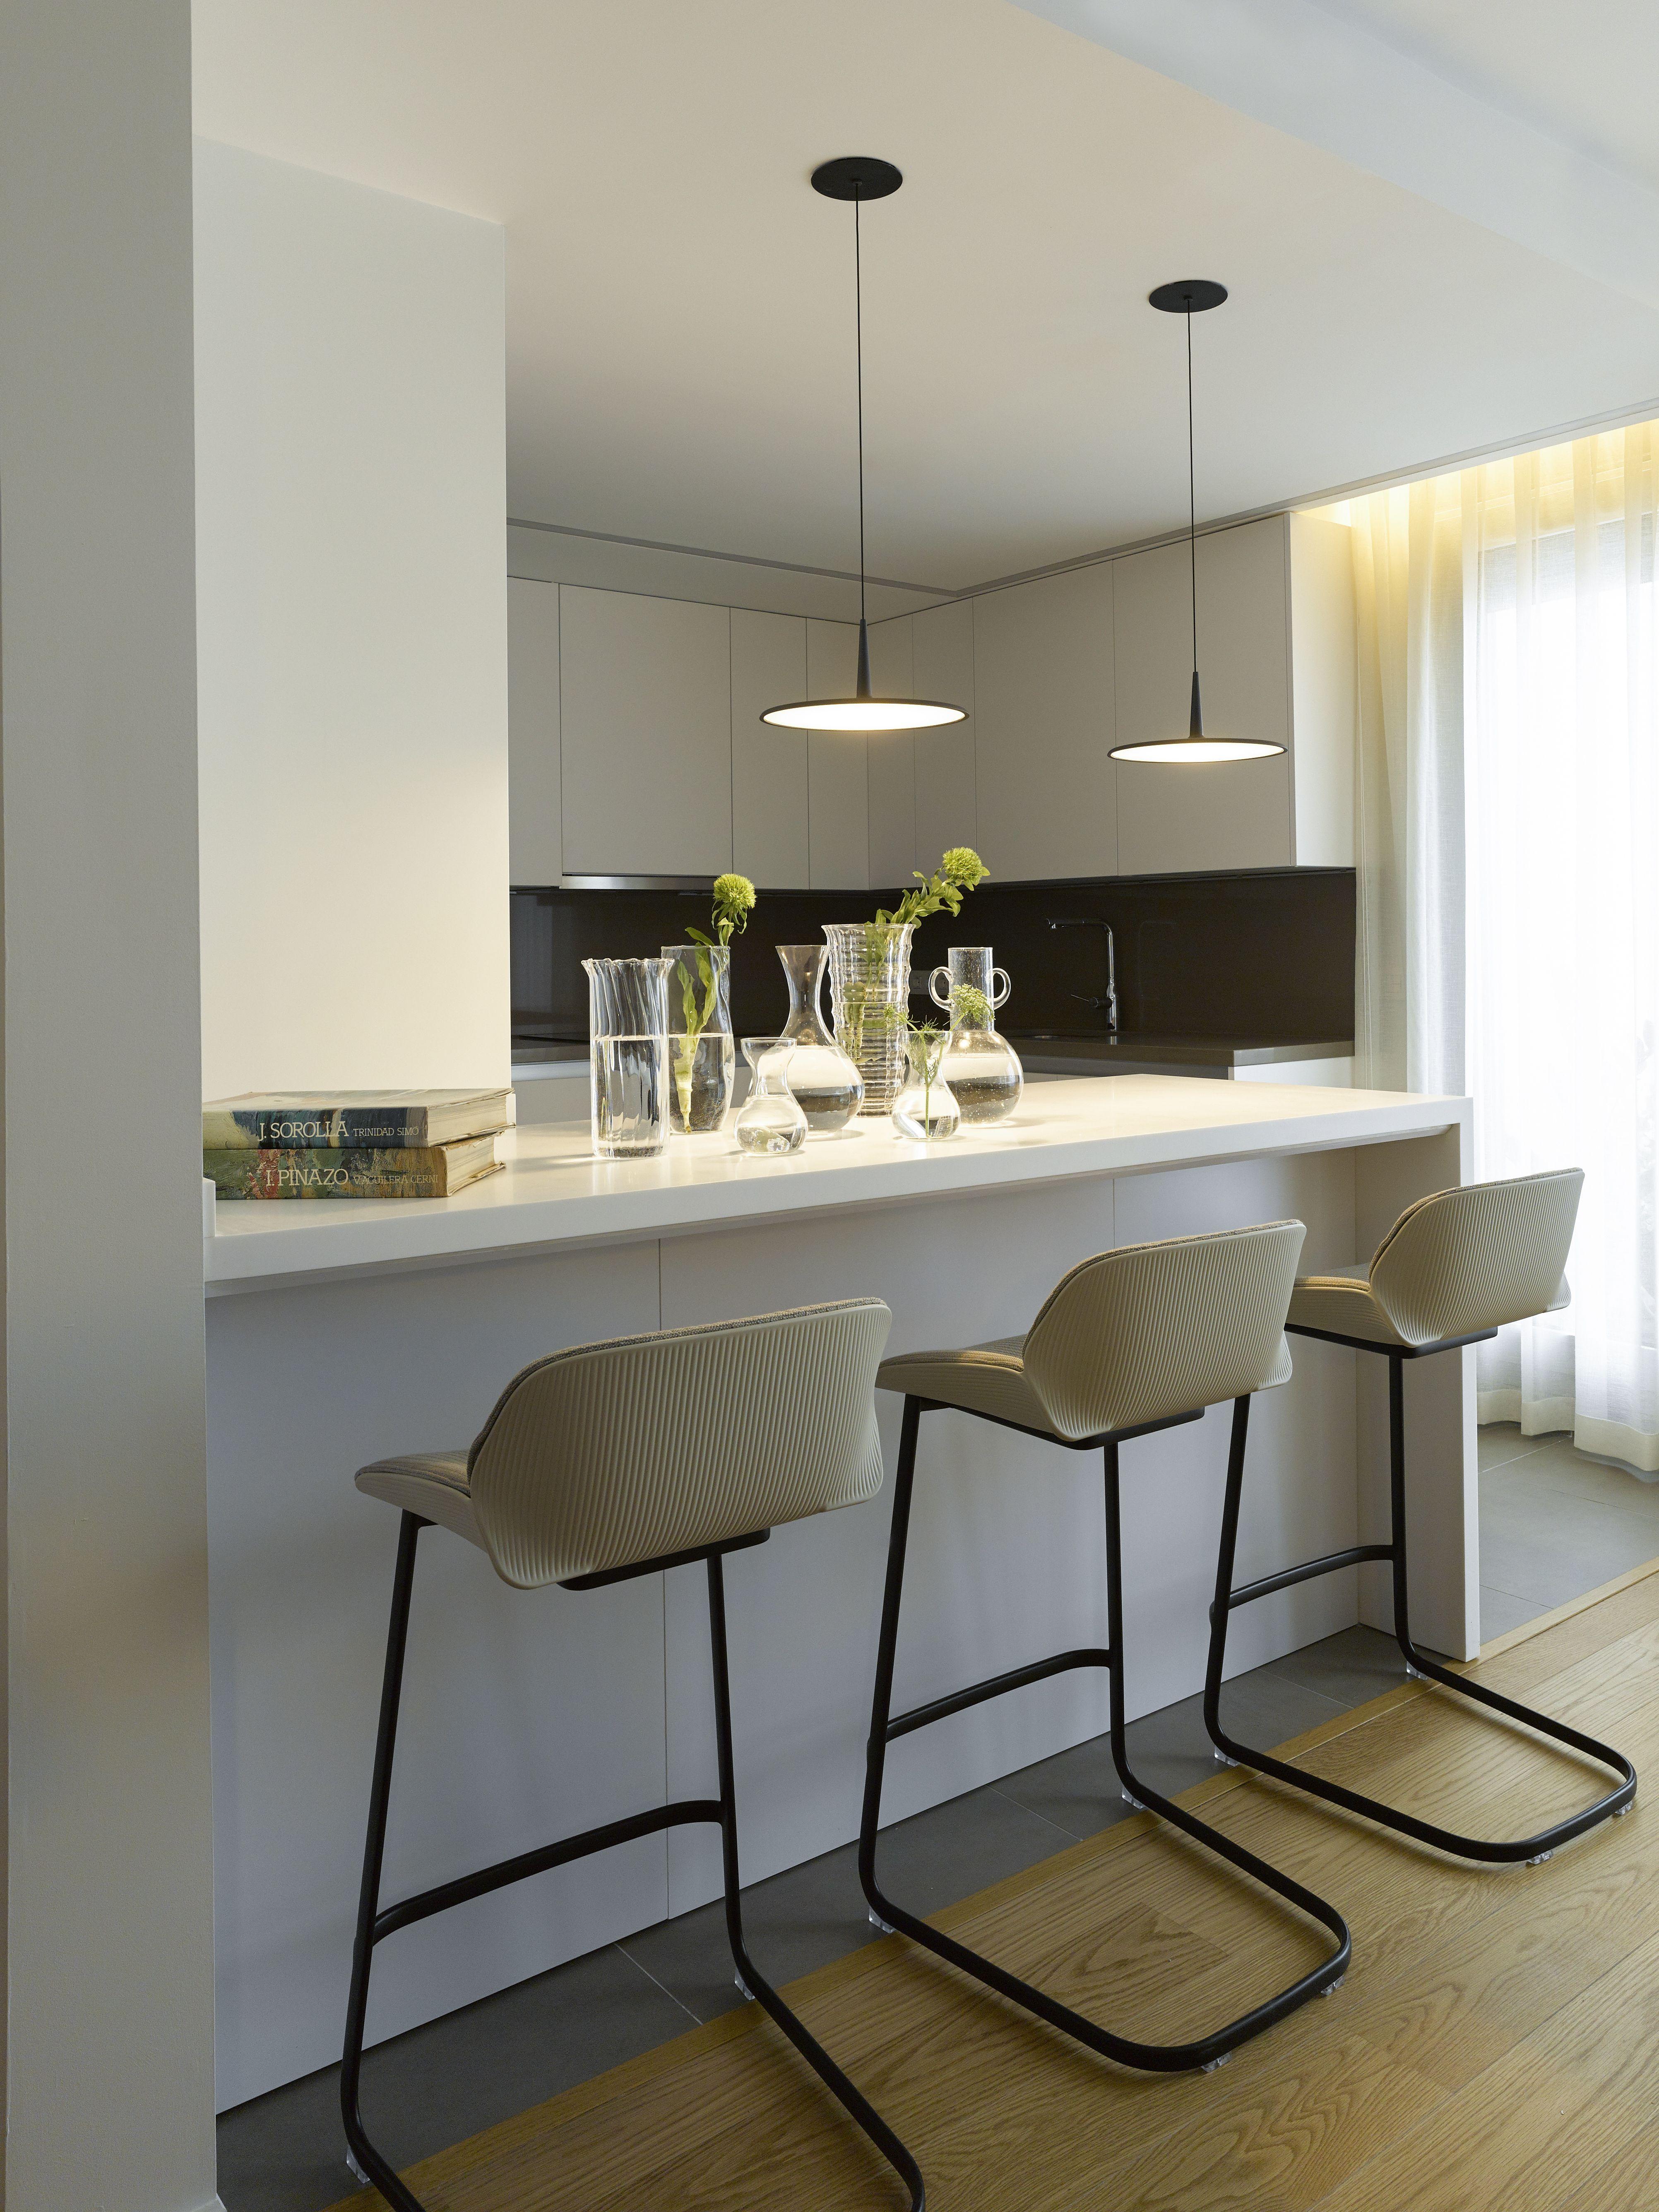 Nuez Stool at Home   Kitchen design, Italian furniture brands ...